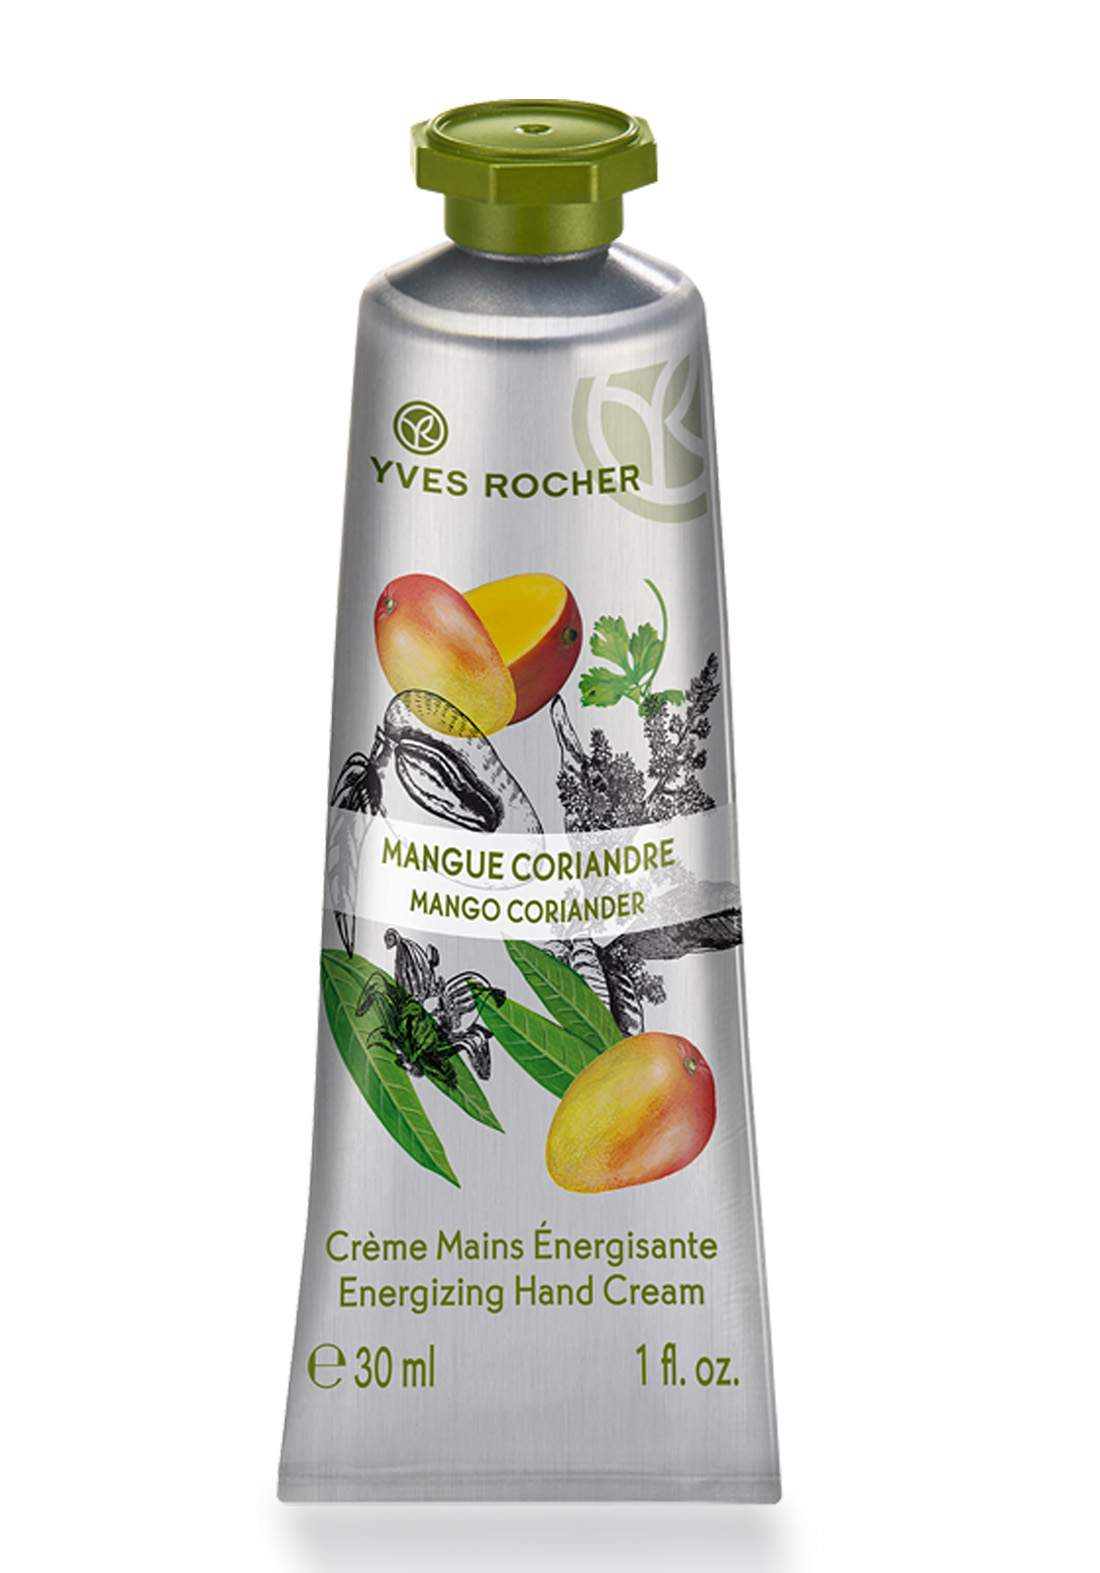 Yves Rocher 27714 Mango Coriander Hand Cream 30 ml  كريم مرطب لليدين